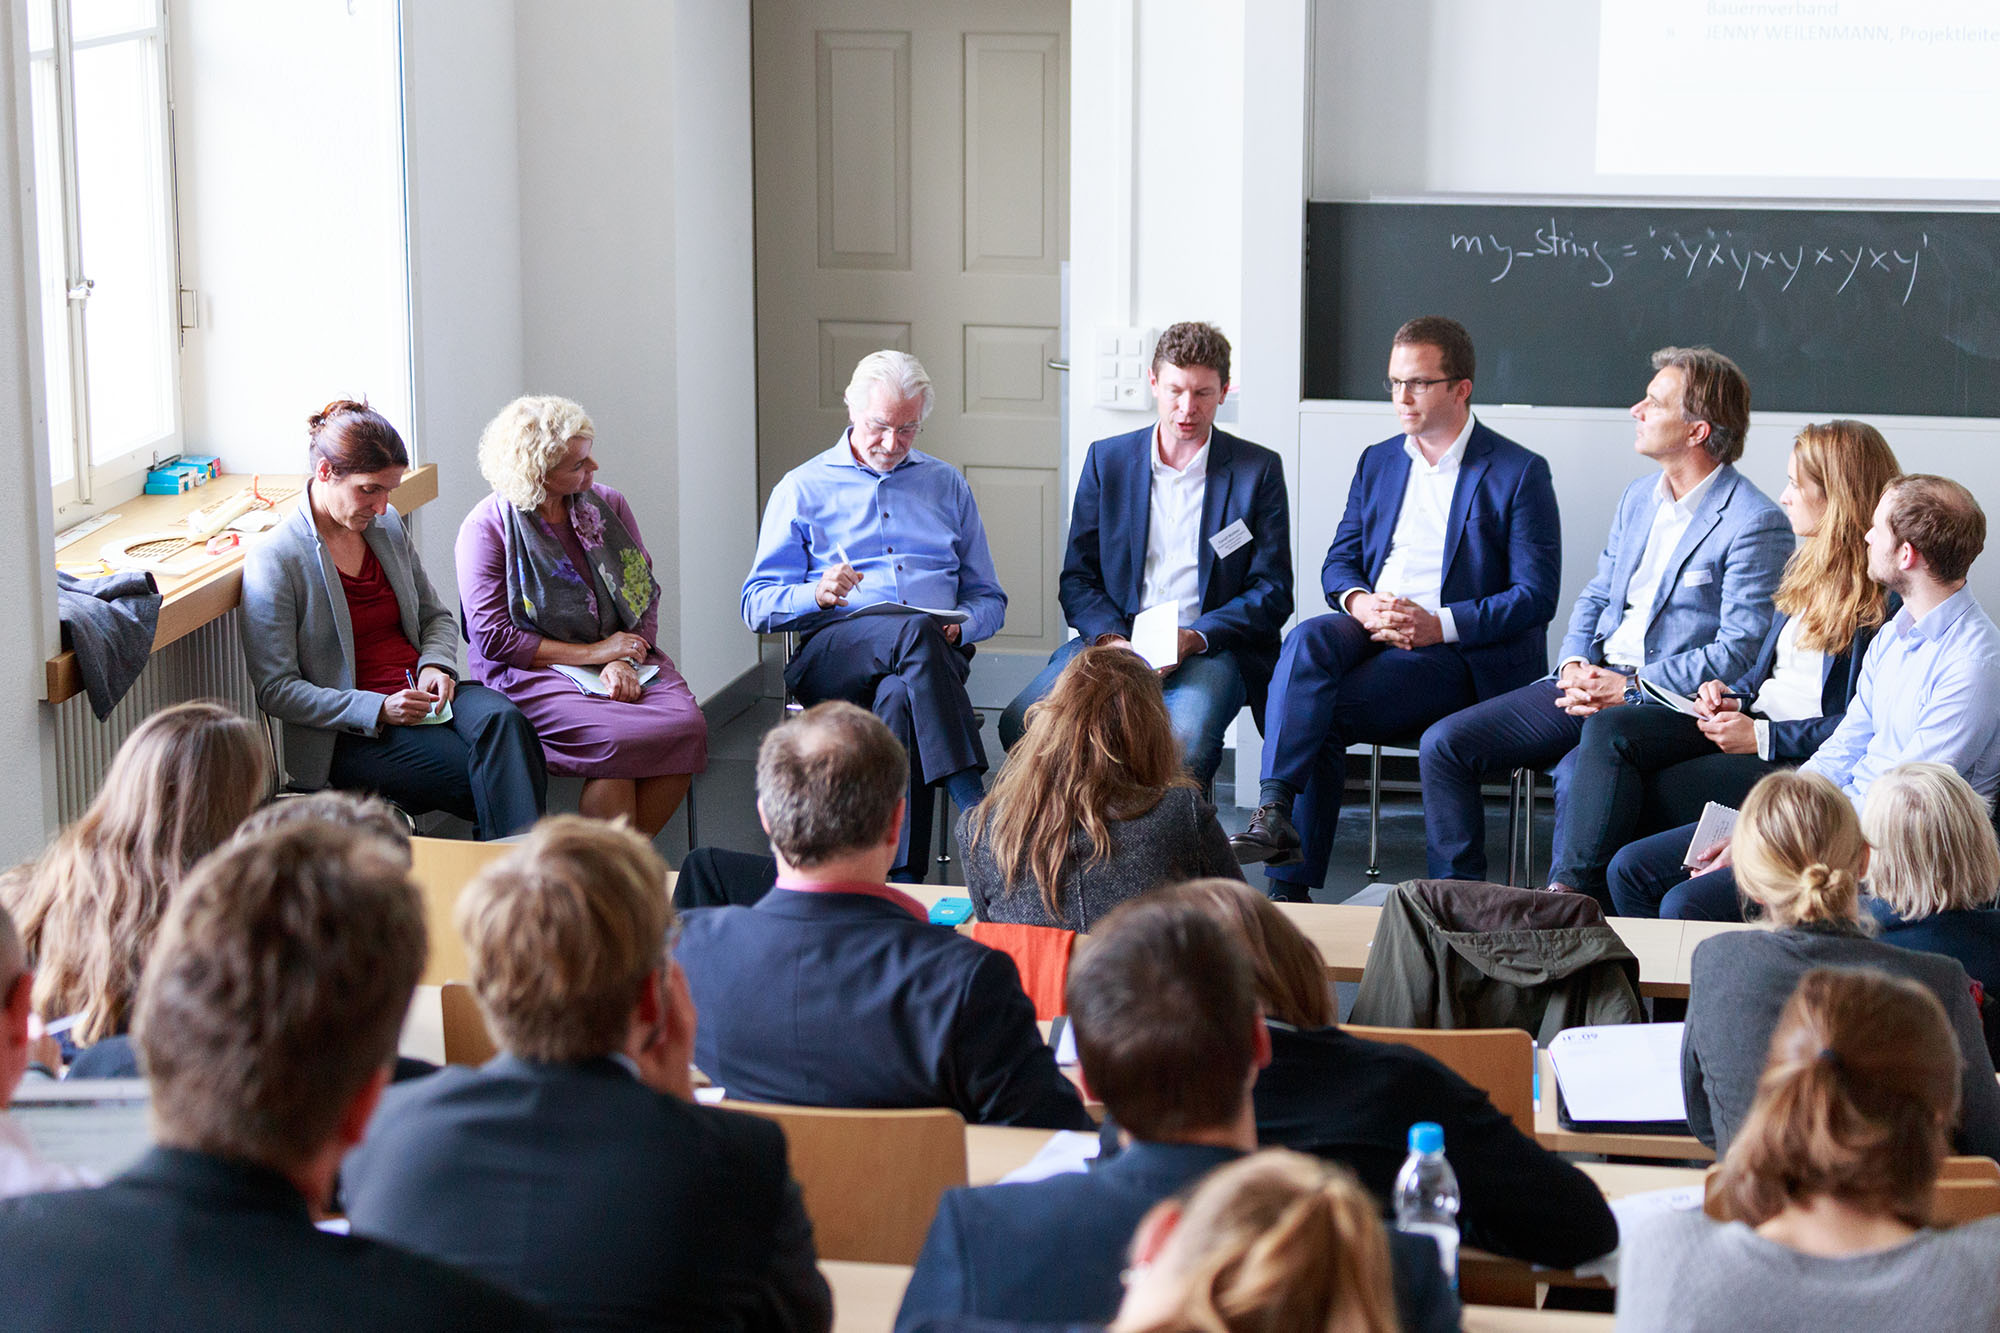 Fabienne Thomas, Regina Ammann, Hans-Rudolf Herren, Toralf Richter, Dominic Meyerhans, Roger Harlacher, Jenny Weilenmann, Felix Harrer